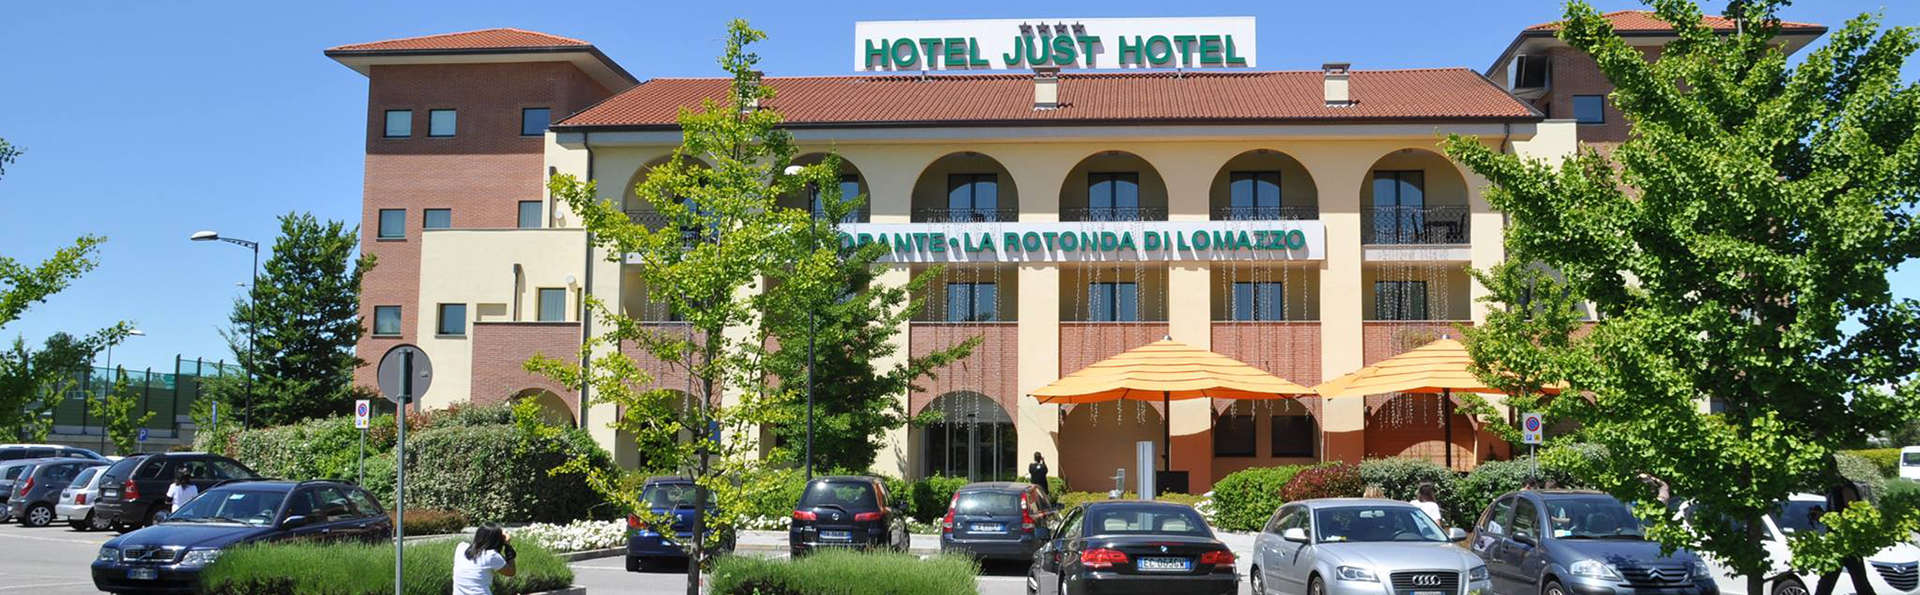 Just Hotel Lomazzo - Edit_Front.jpg